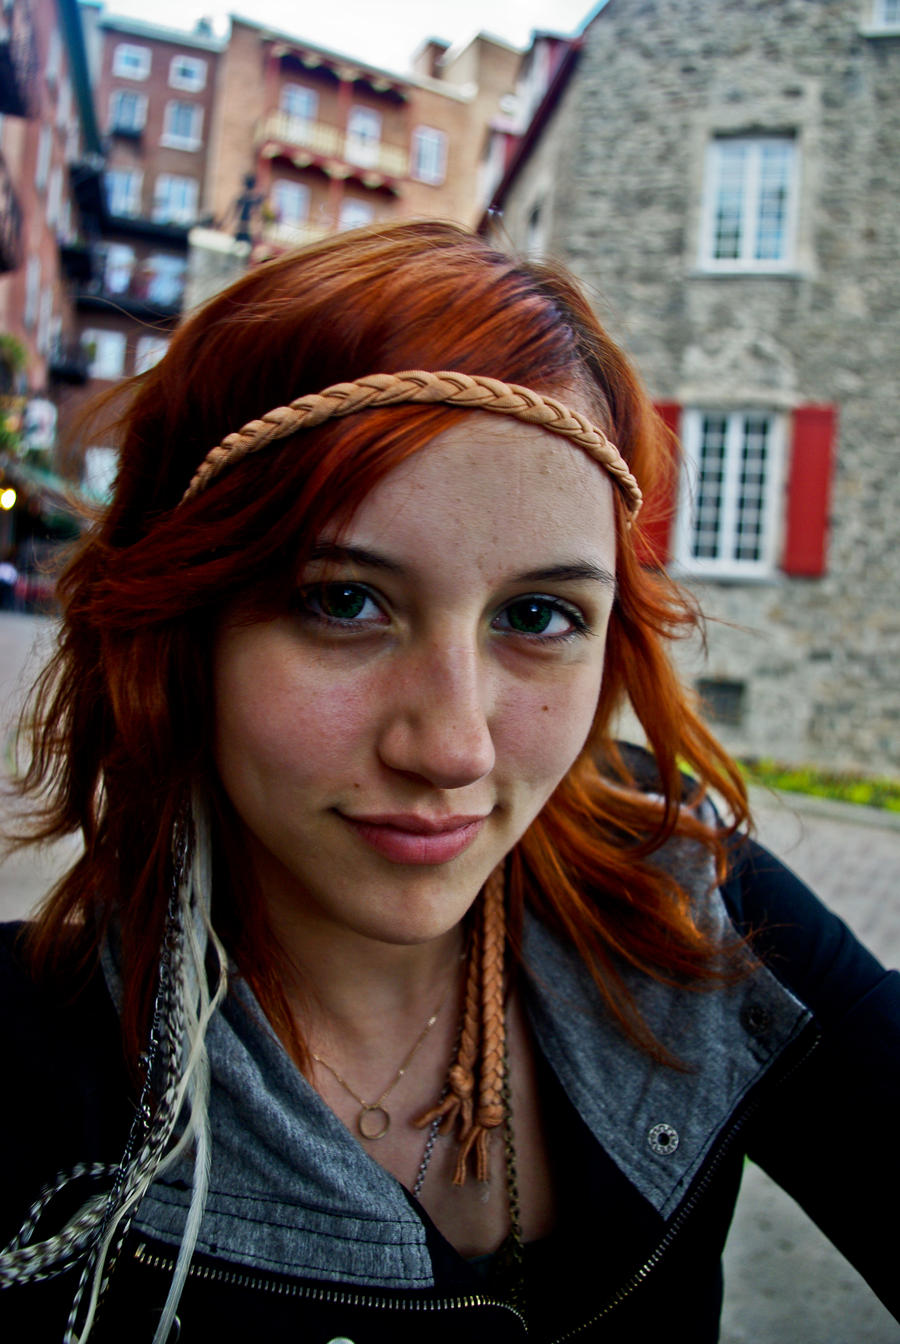 ABureauPhoto's Profile Picture